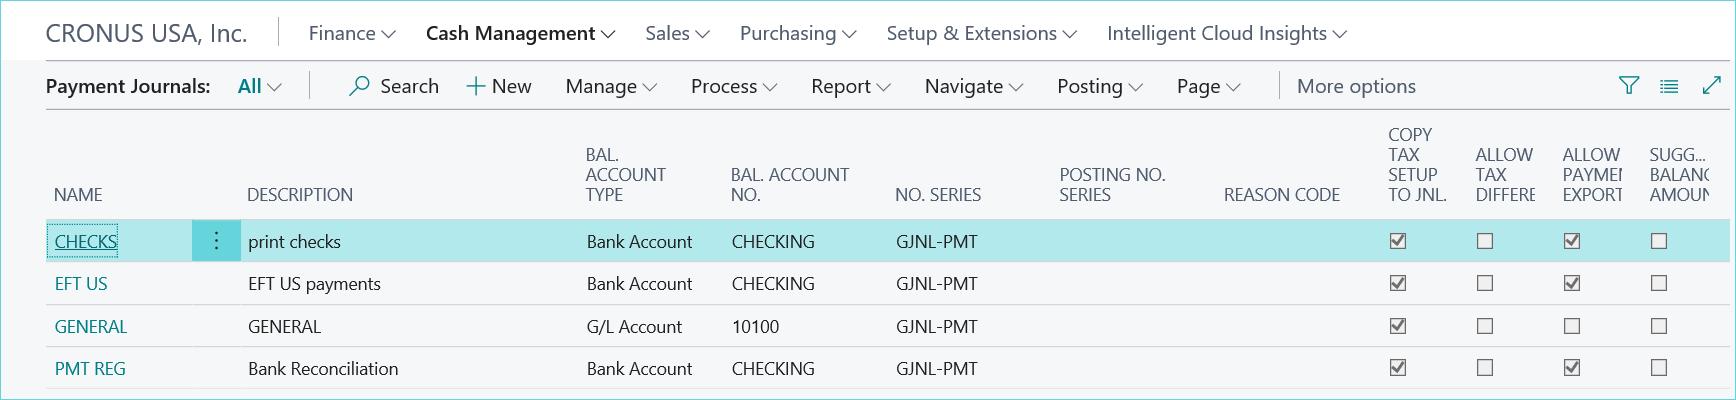 D365 Print Check Process